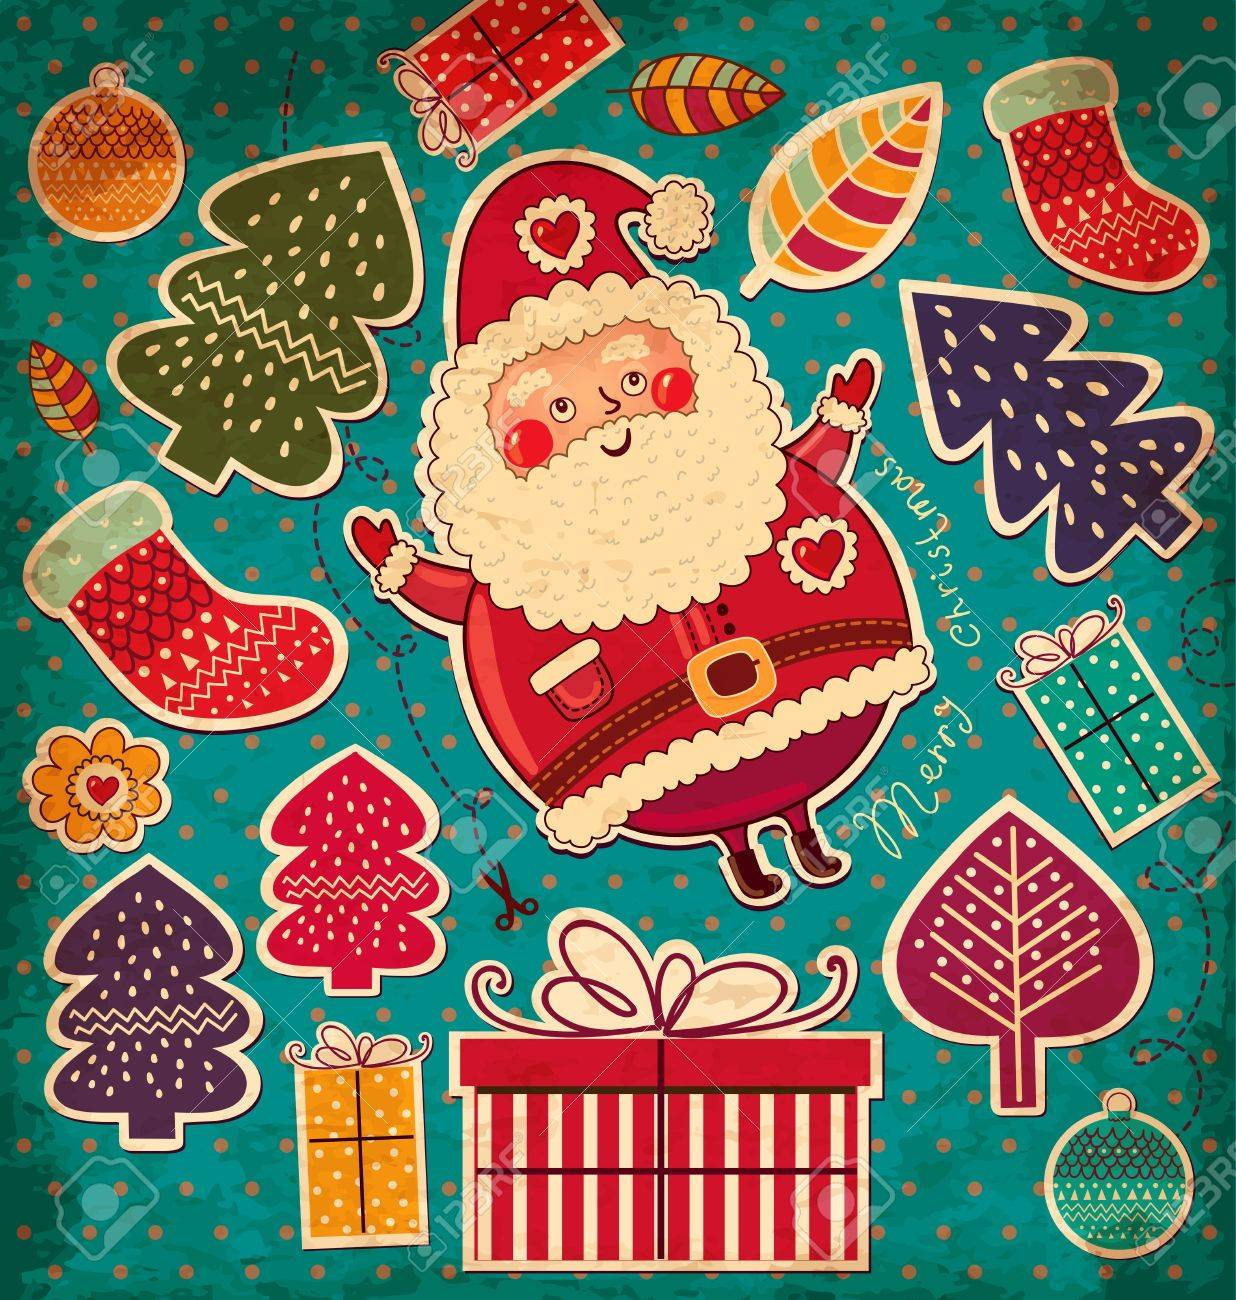 Vintage vector Christmas card with Santa Claus Stock Vector - 15380658